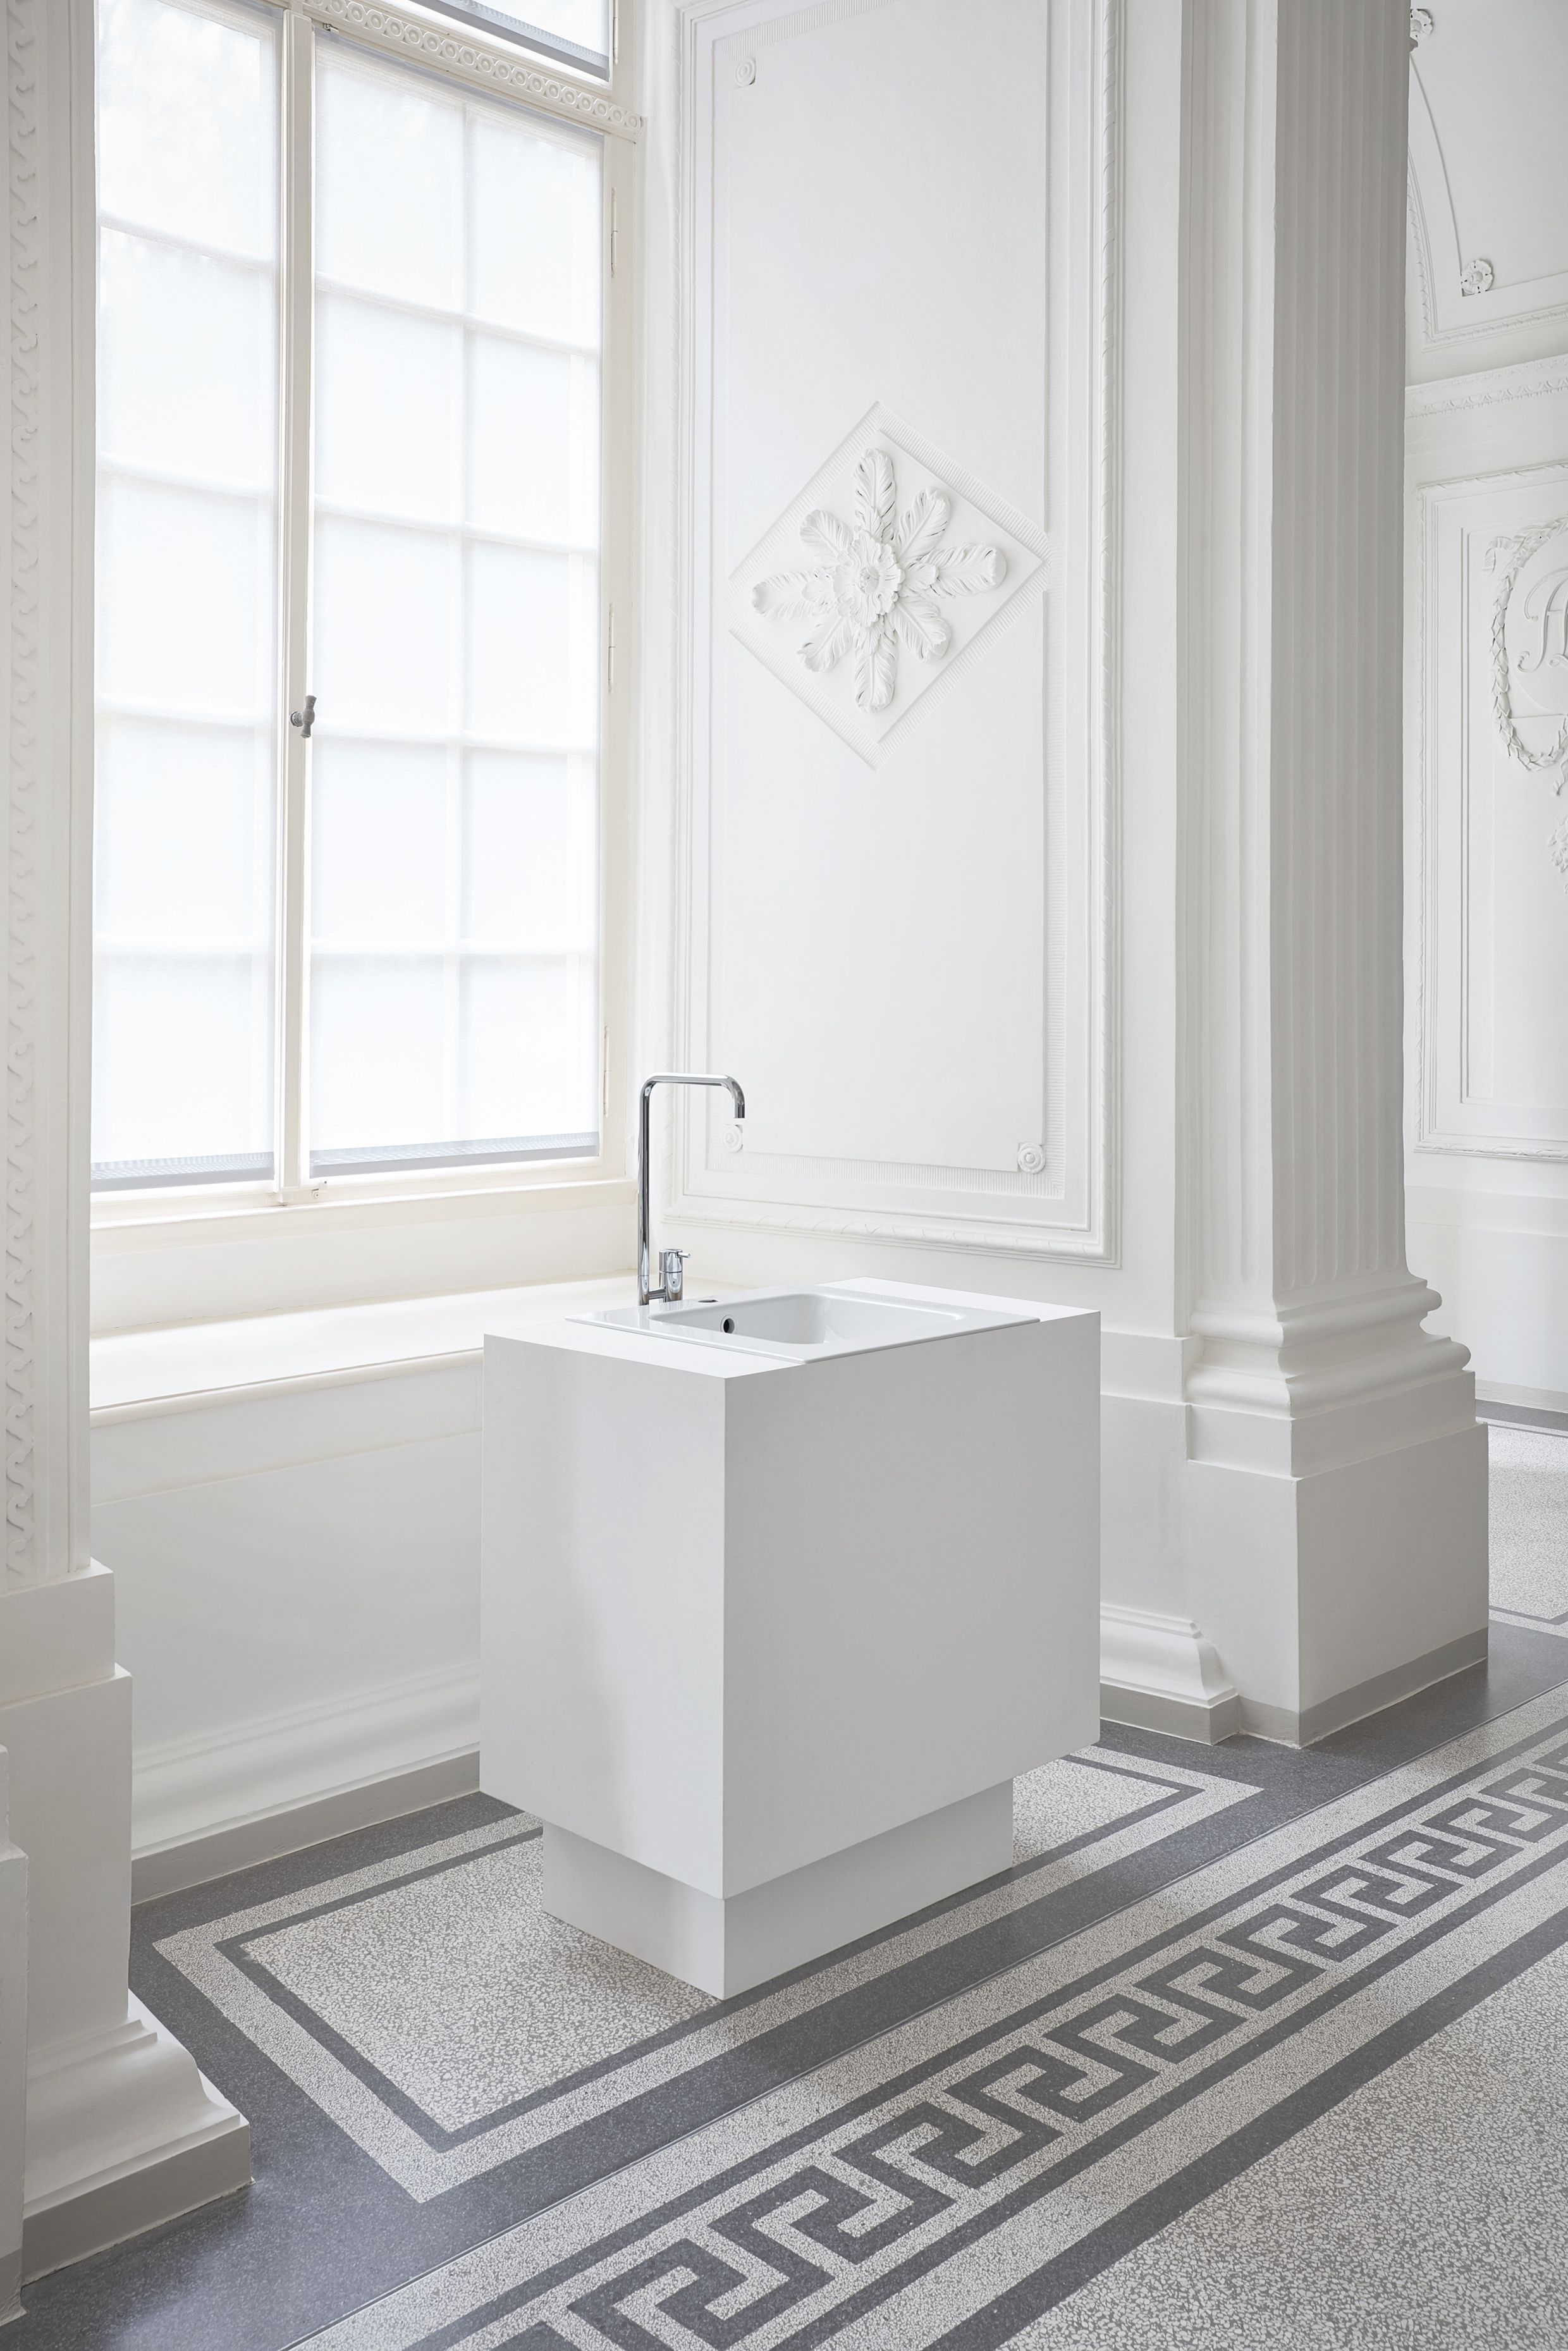 Bette Photography By Studio Christoph Sagel Berlin Bathroom Design Minimalist Design Style Wash Basin